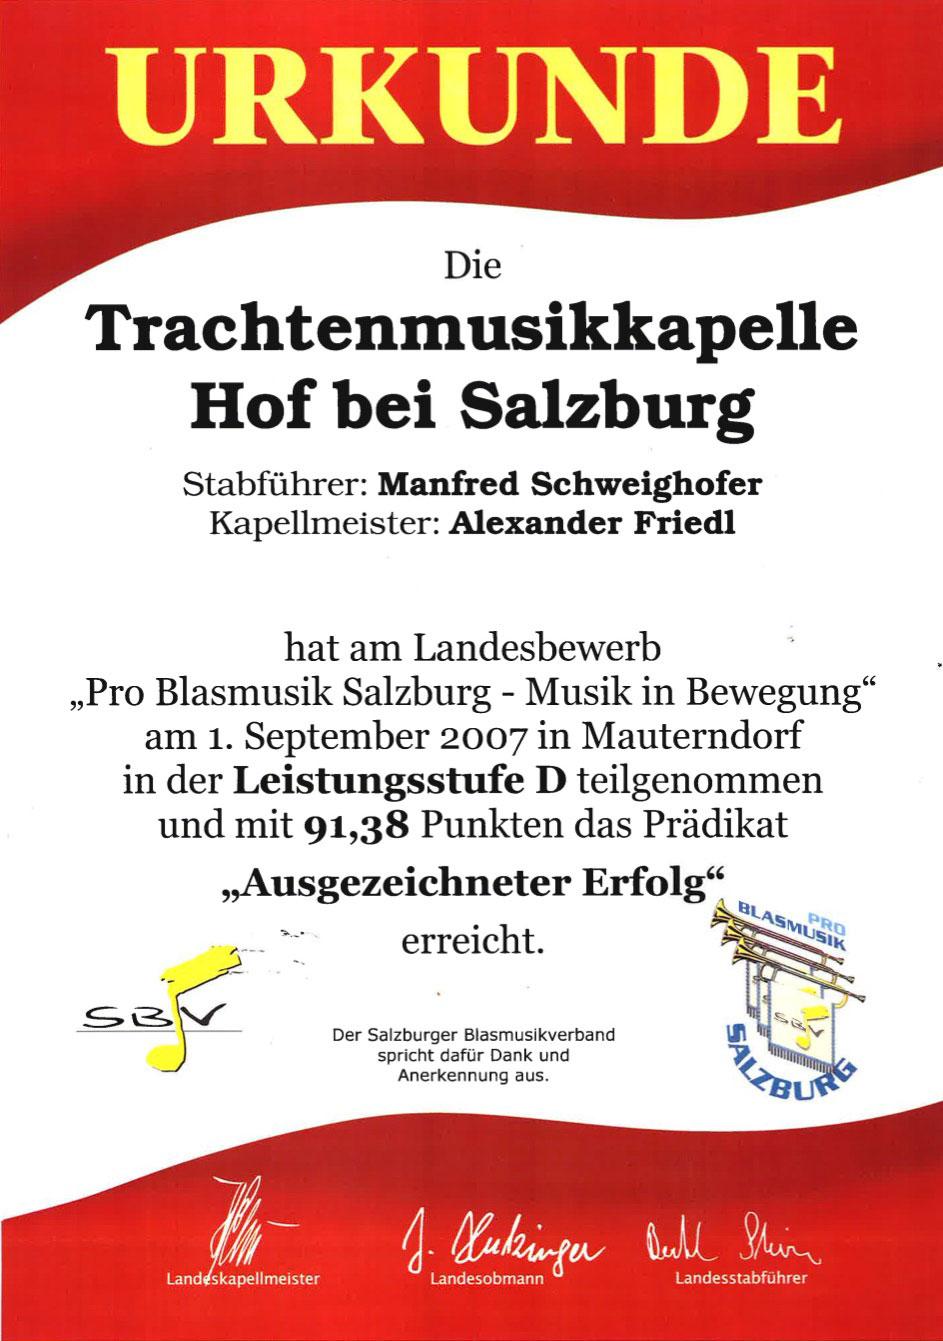 2007-Landesbewerb-Mauterndorf